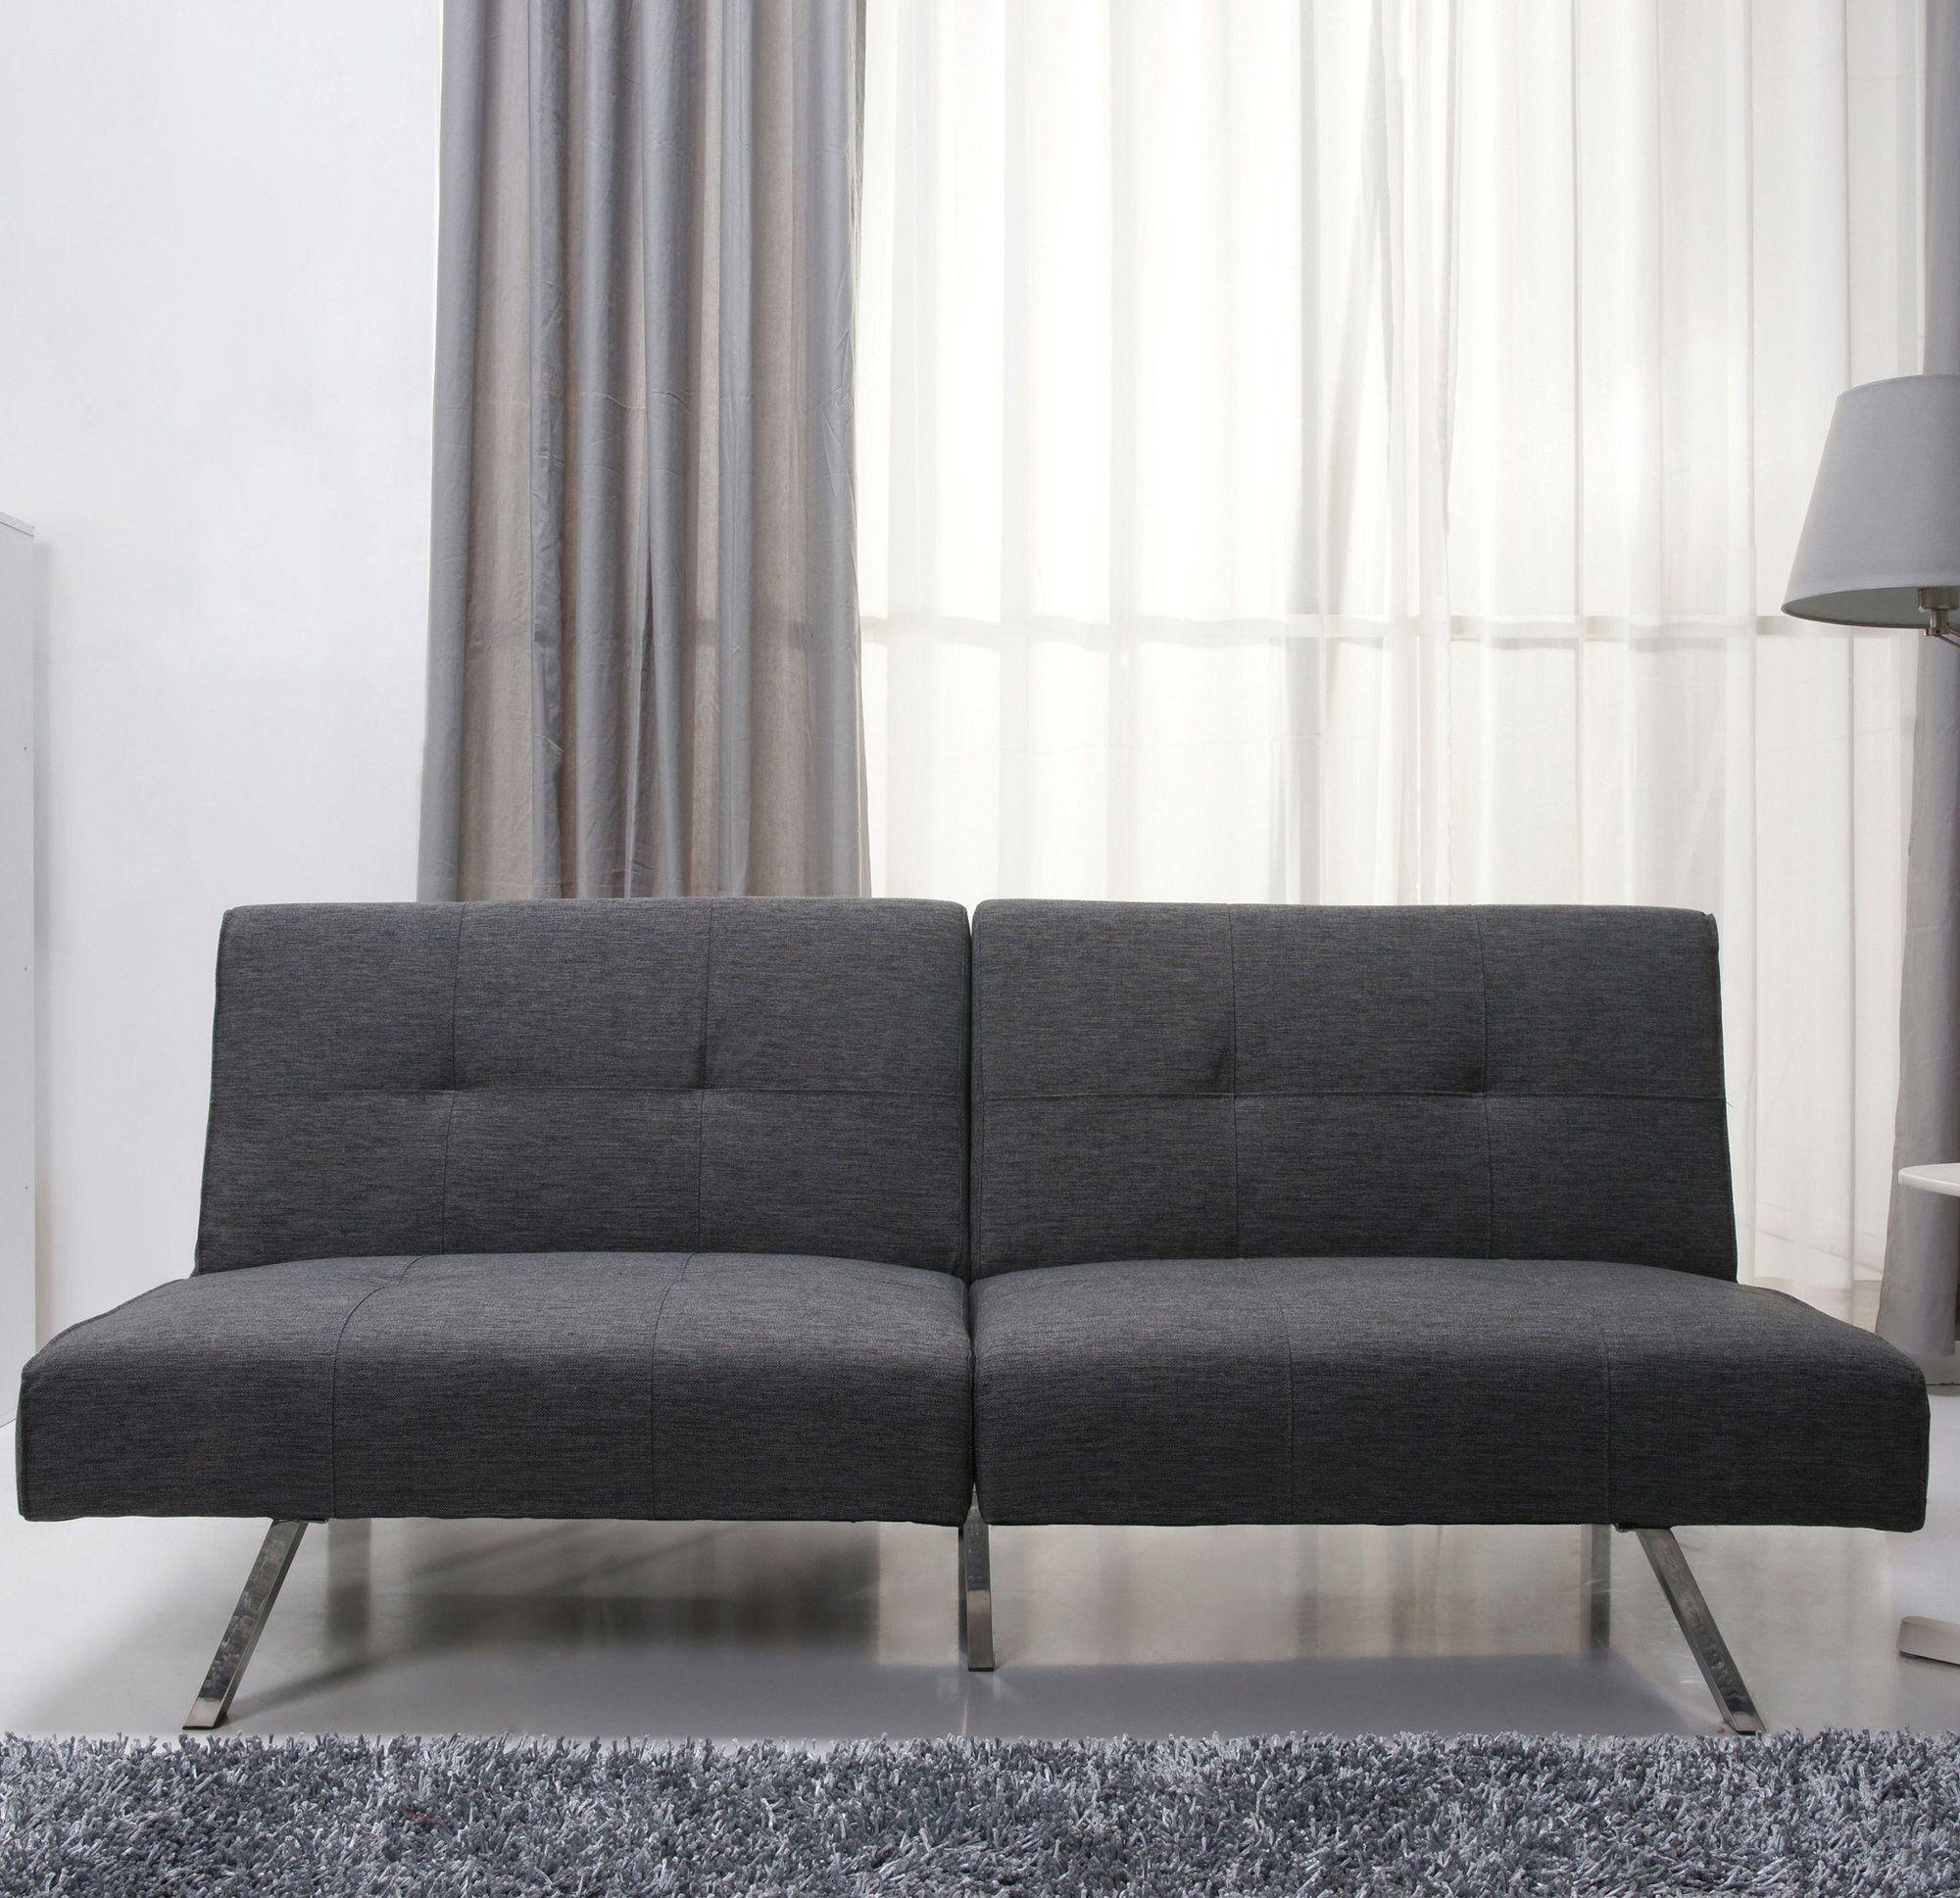 Rosen Foldable Futon Sofa Bed Products Pinterest